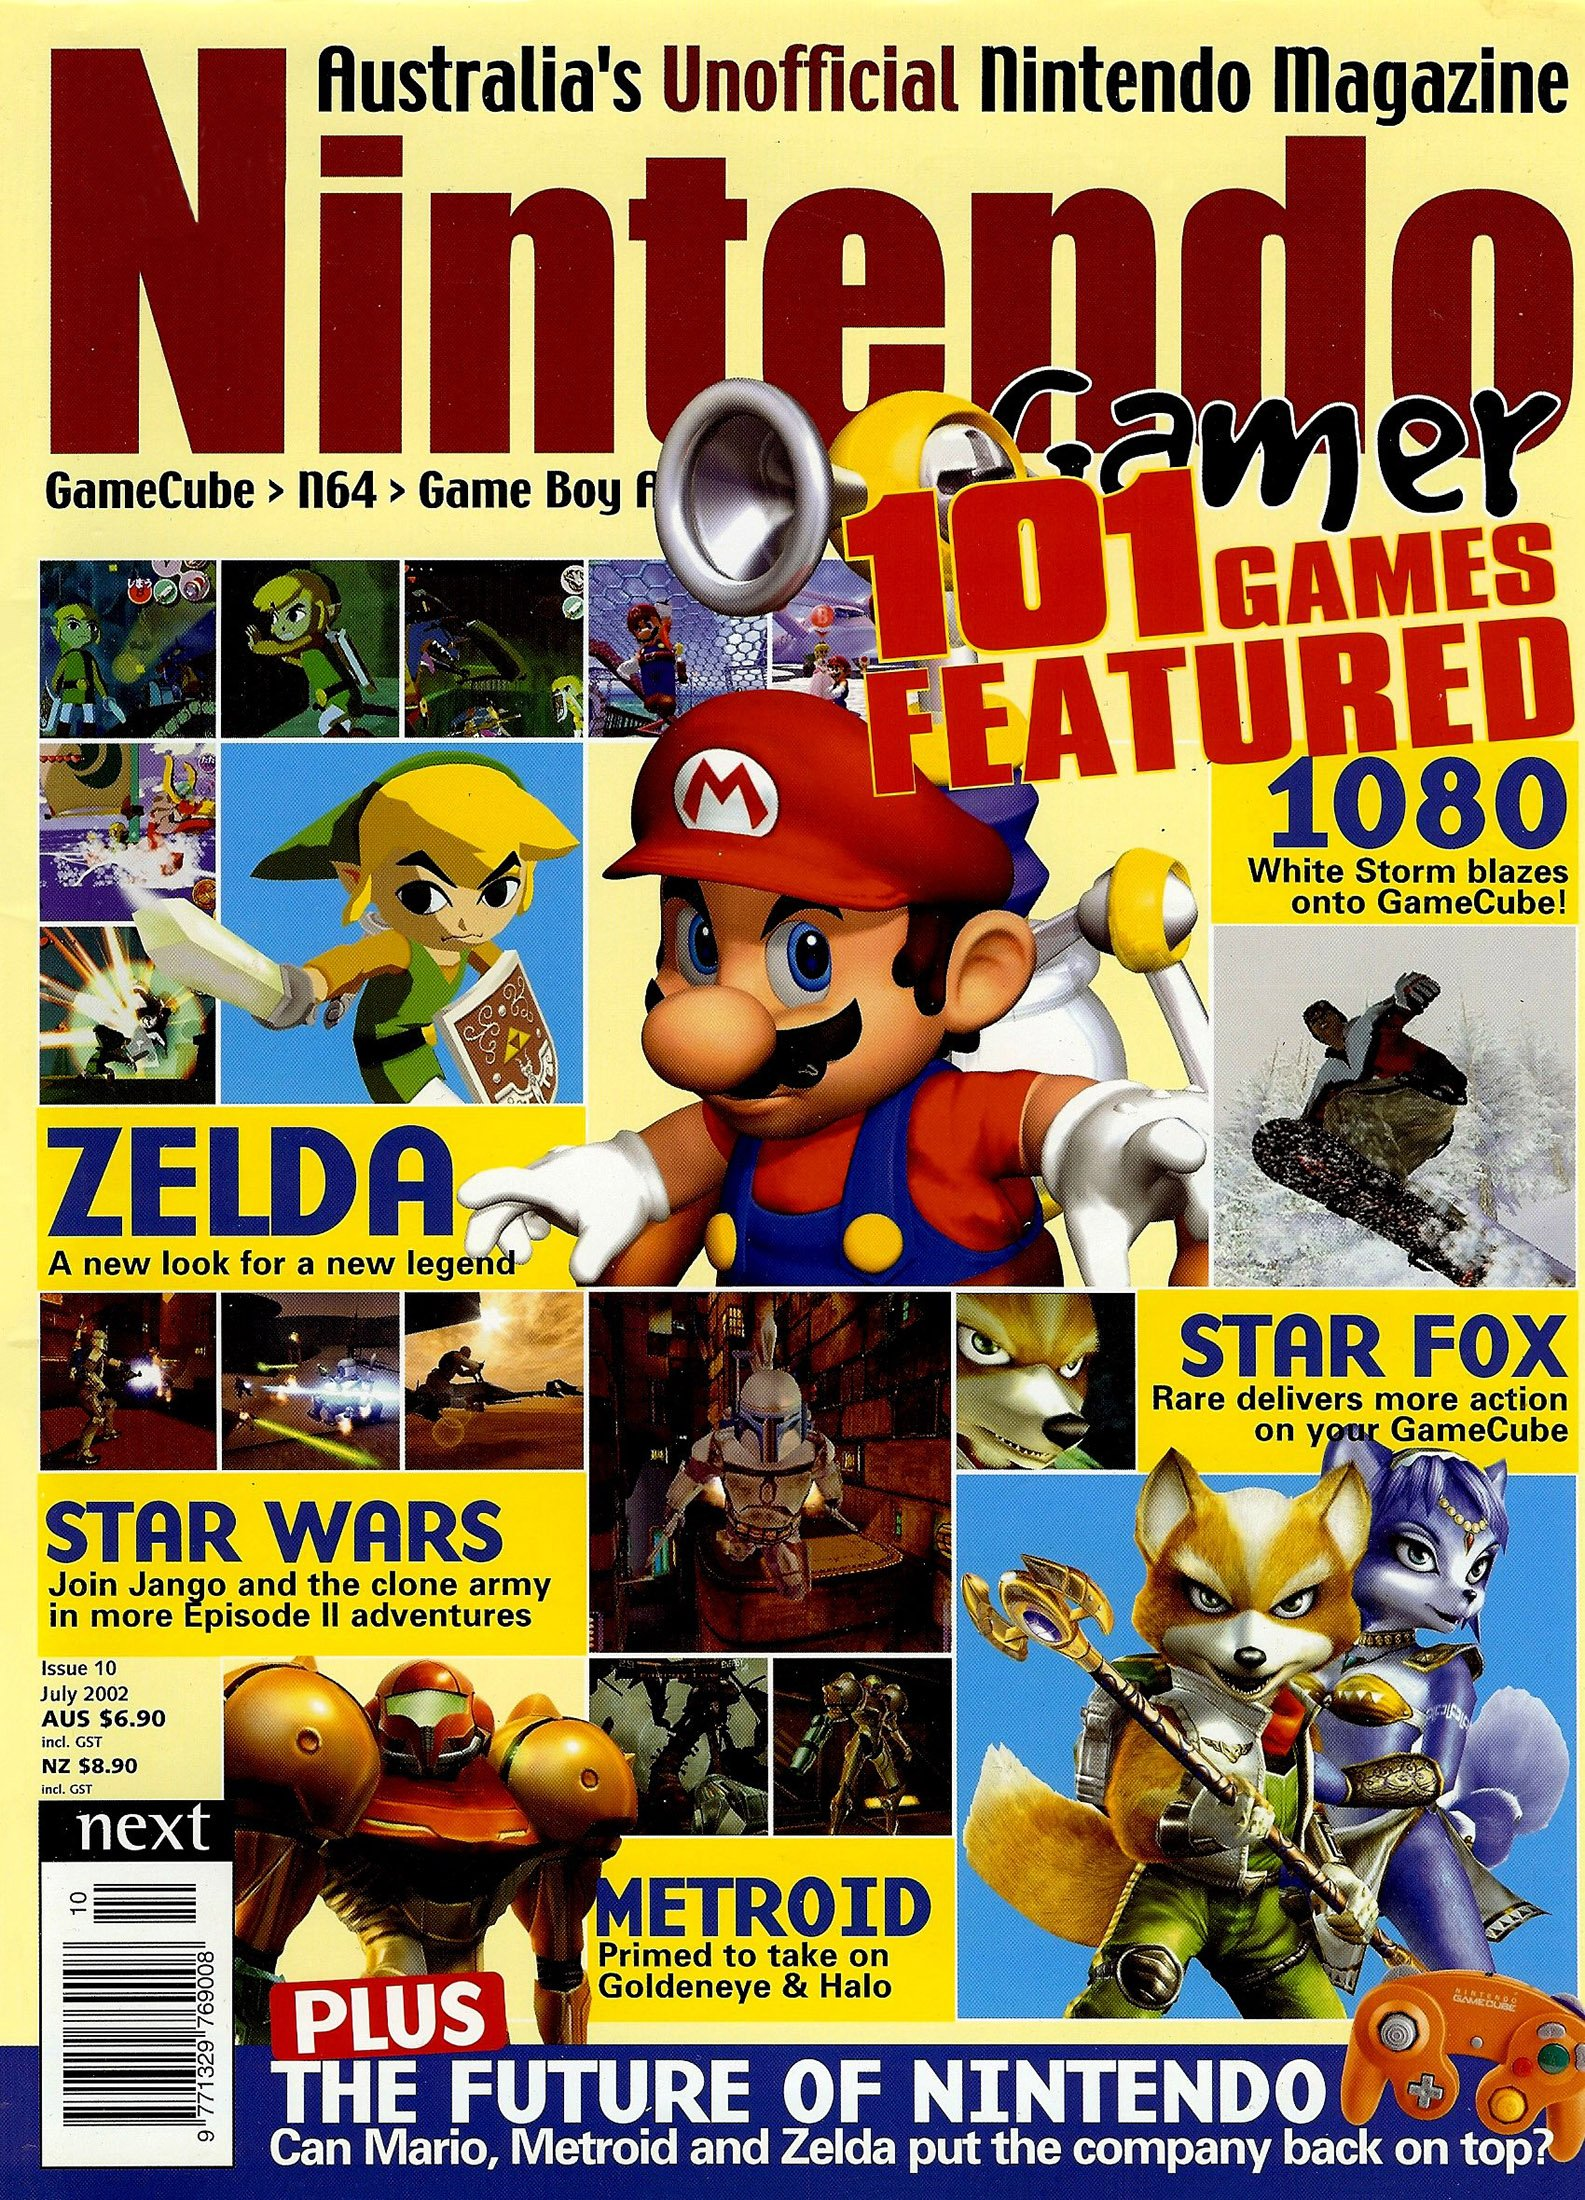 Nintendo Gamer Issue 10 (July 2002)